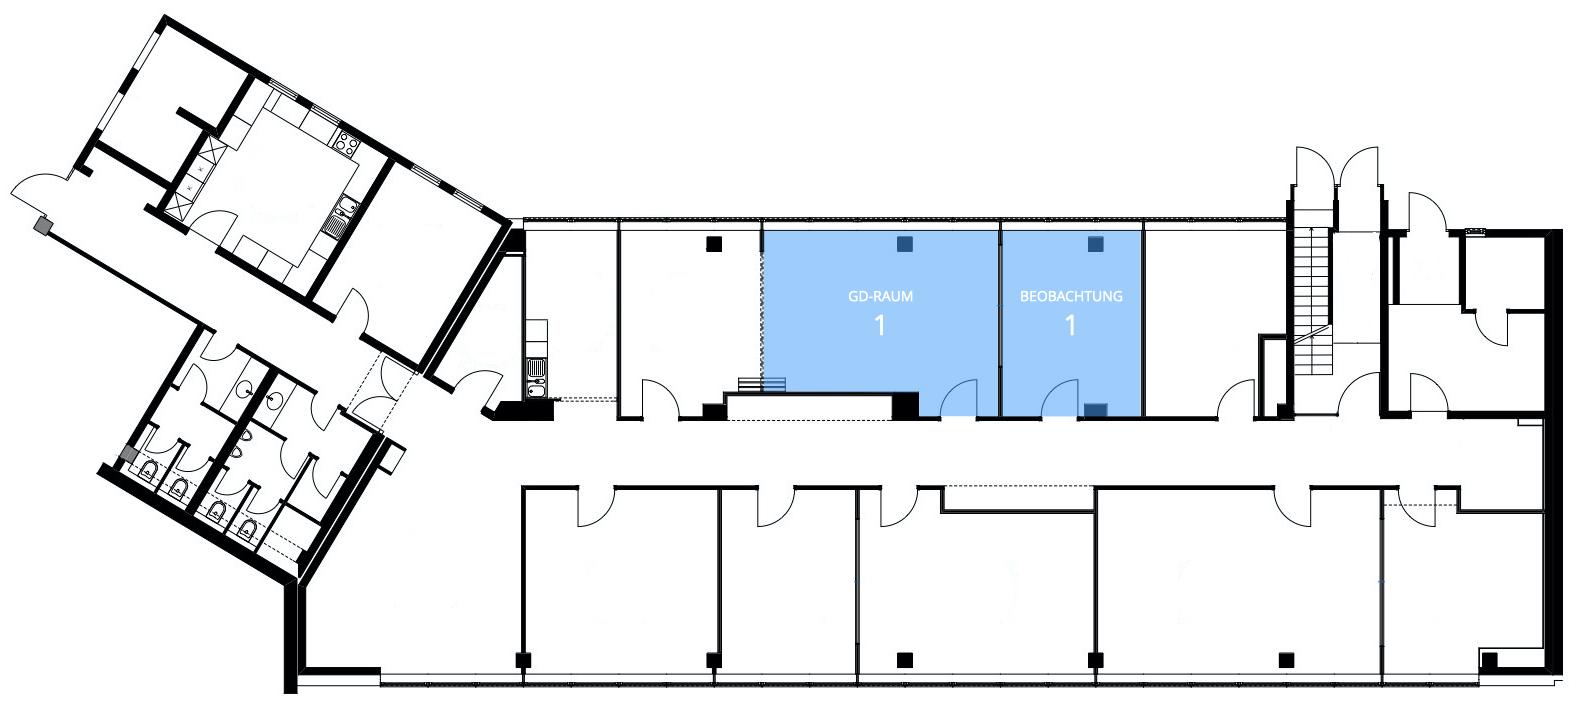 iTEMS Grundriss: GD-Raum 1